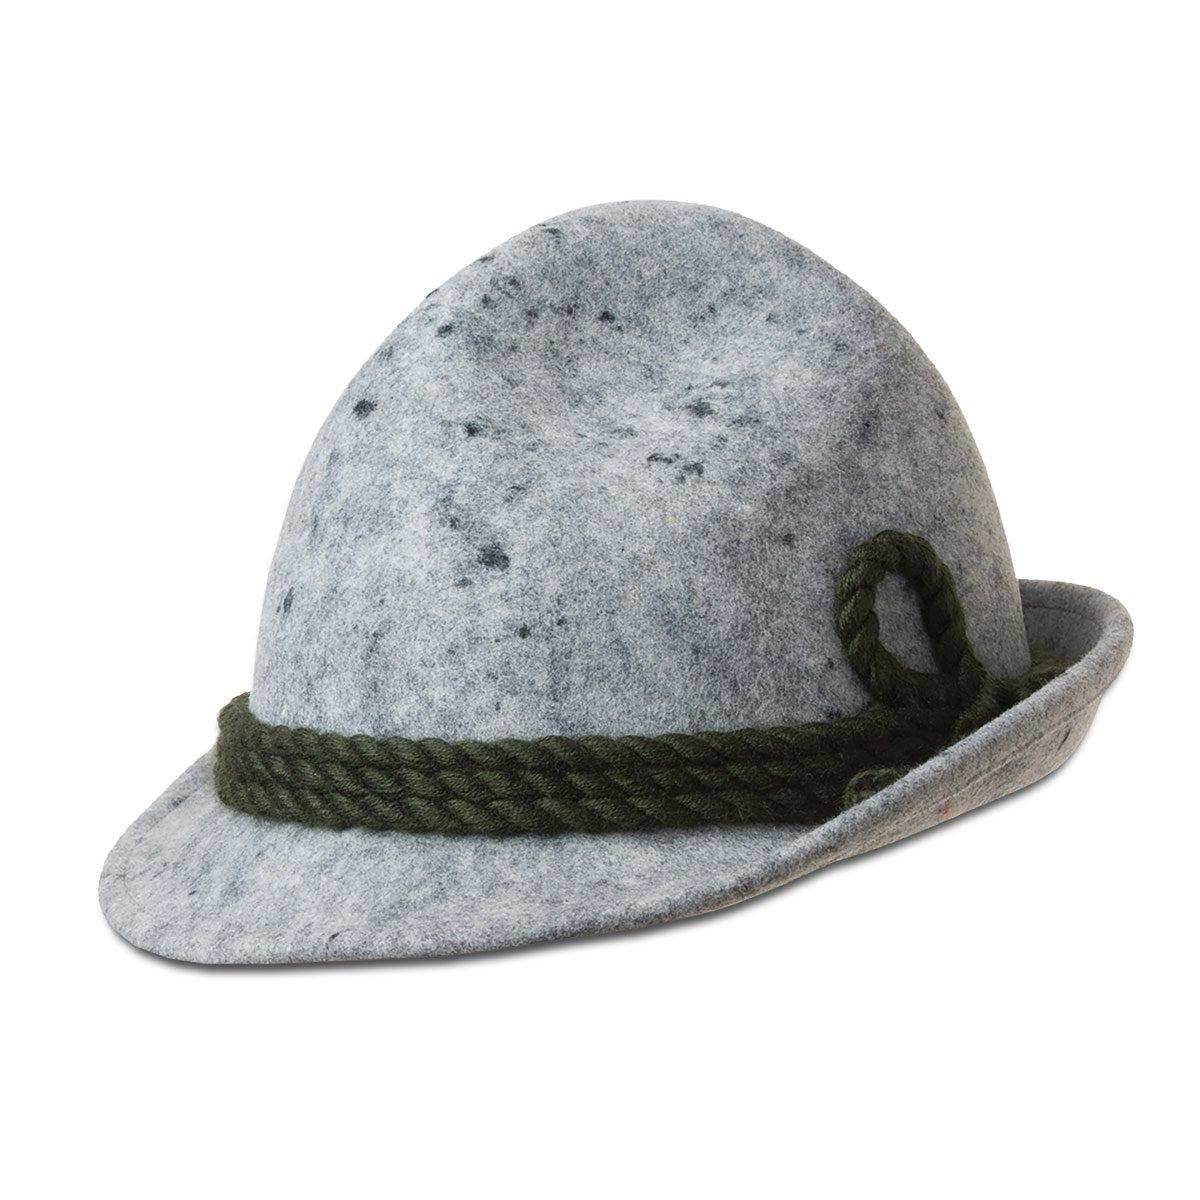 Mountain hat handmade in wool felt signed hutter jpg 1200x1200 Mountain hats da7bbd1ead7b